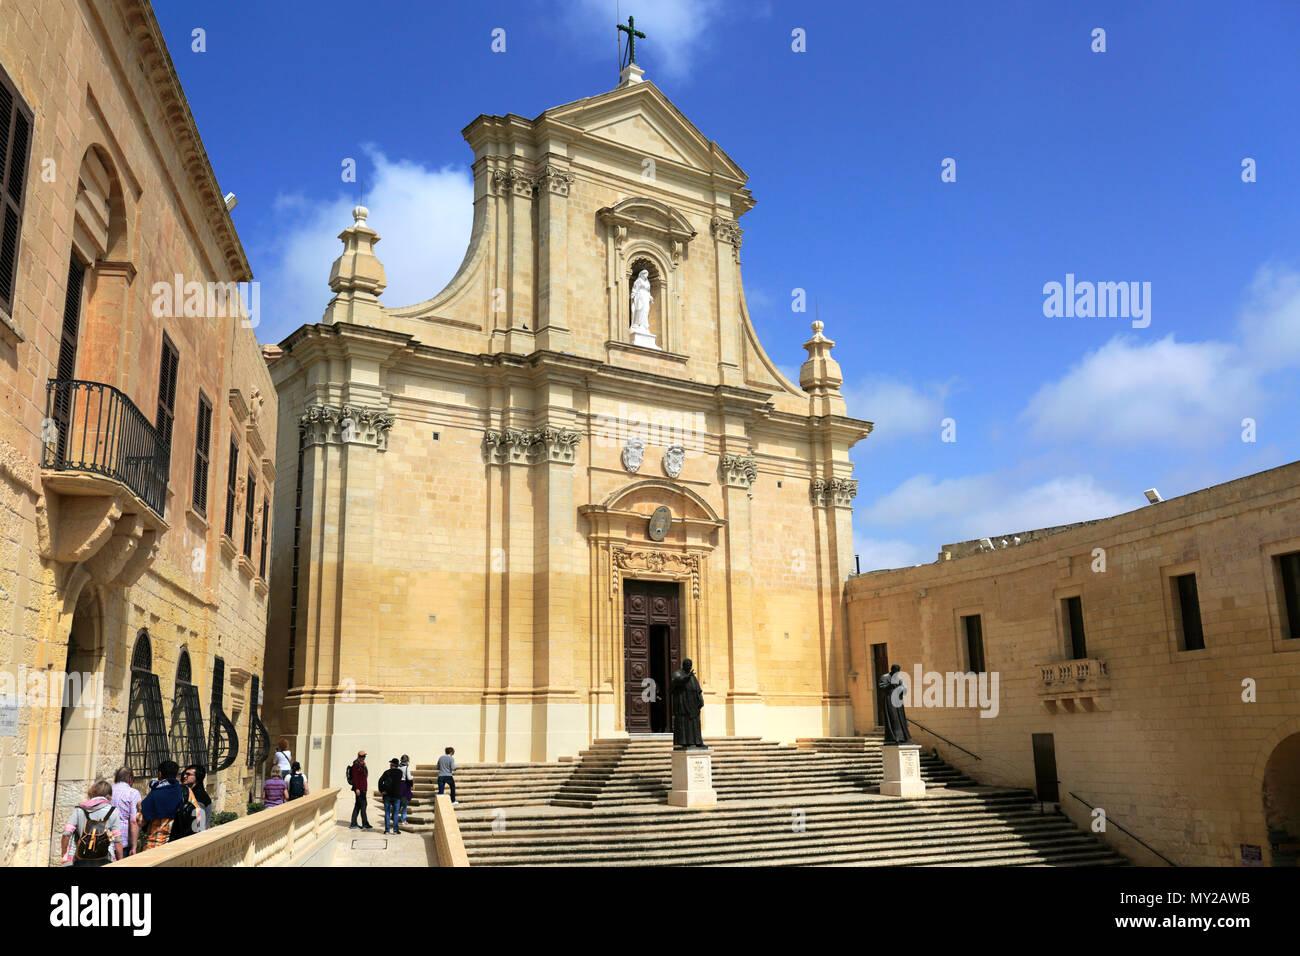 Summer view of the Cittadella, in Victoria City, Capital of the island of Gozo, Malta - Stock Image